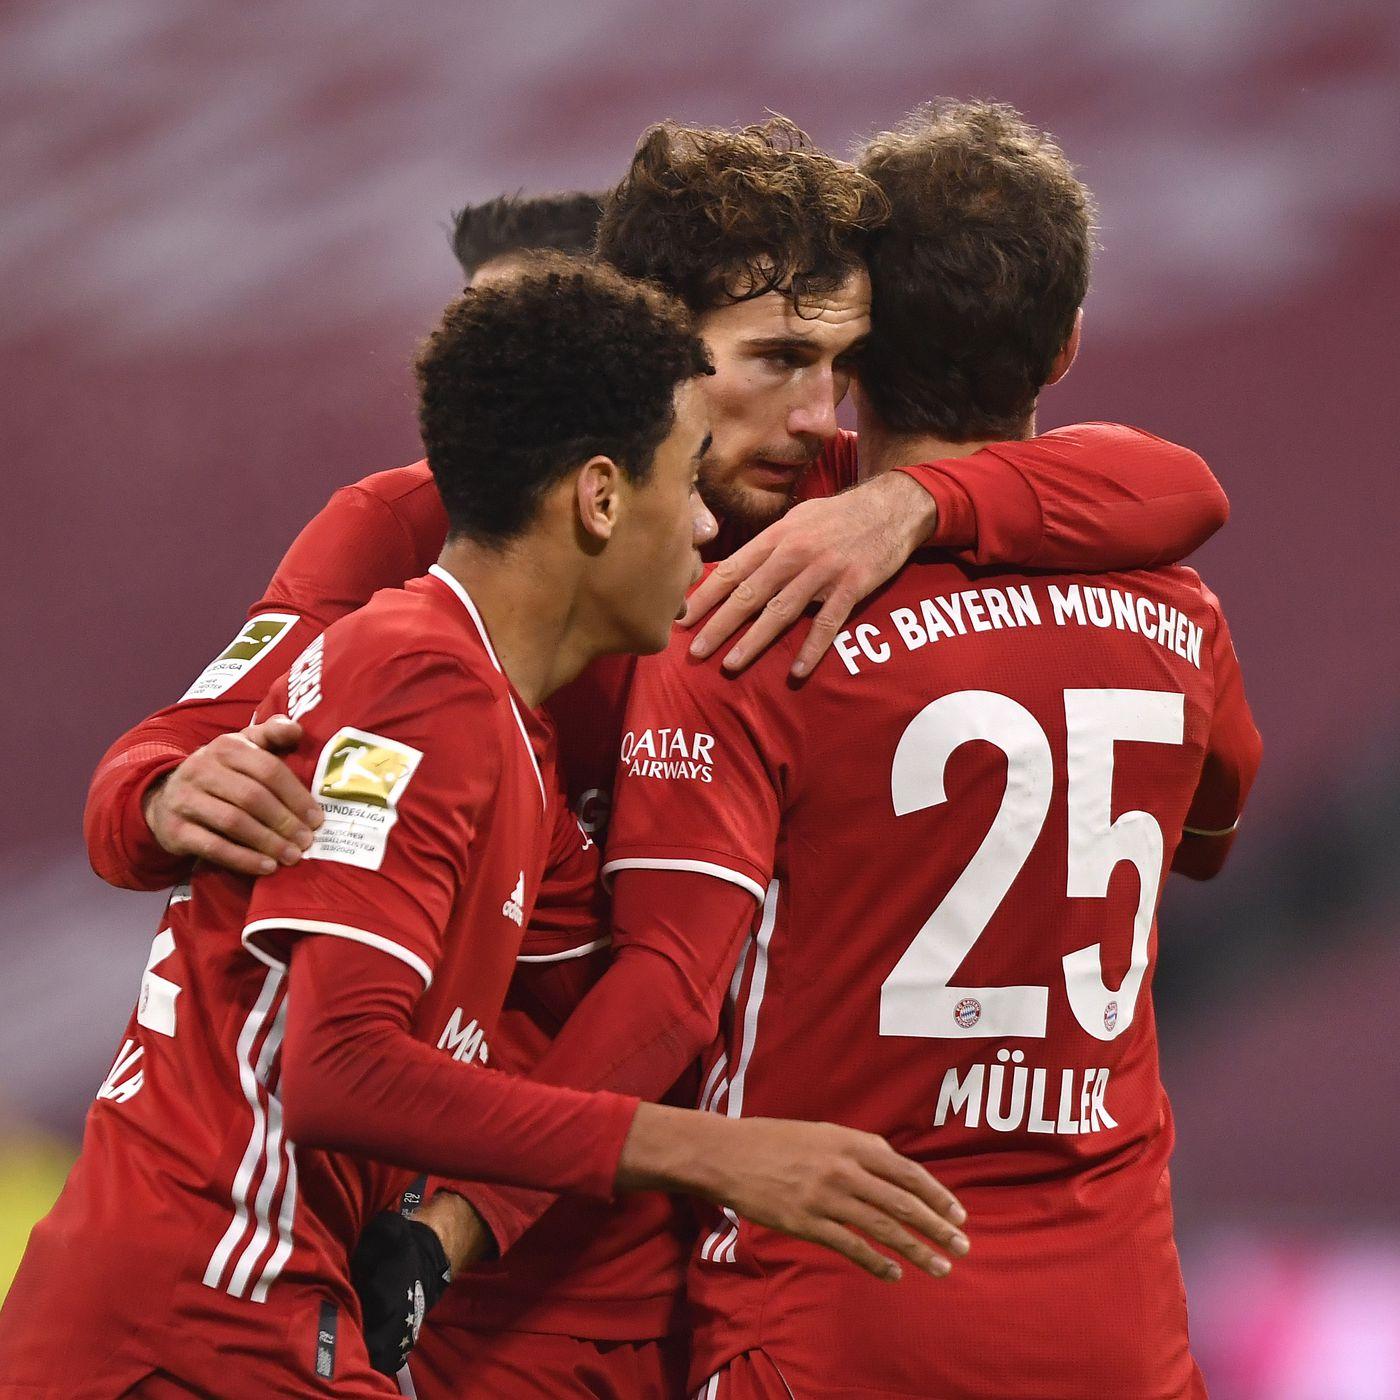 Bayern 3 Rätsel Heute